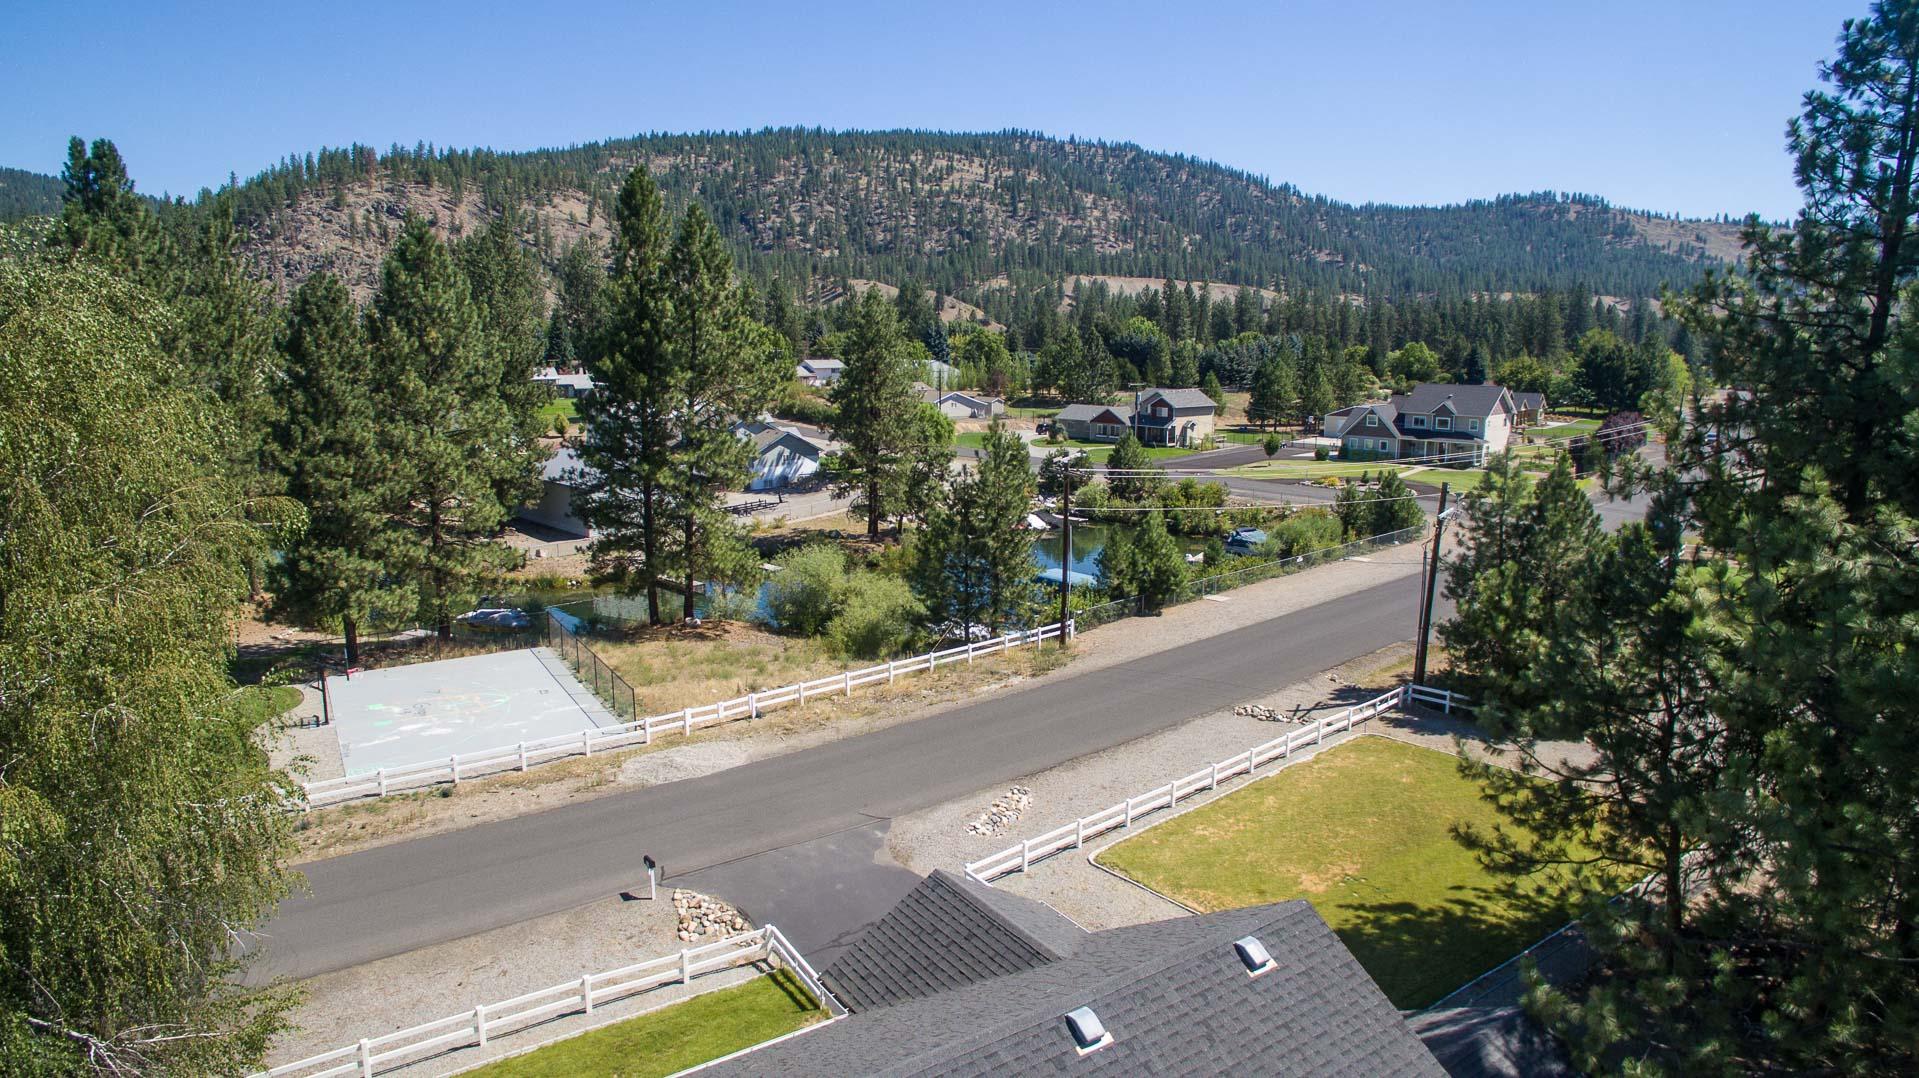 north spokane drone photography